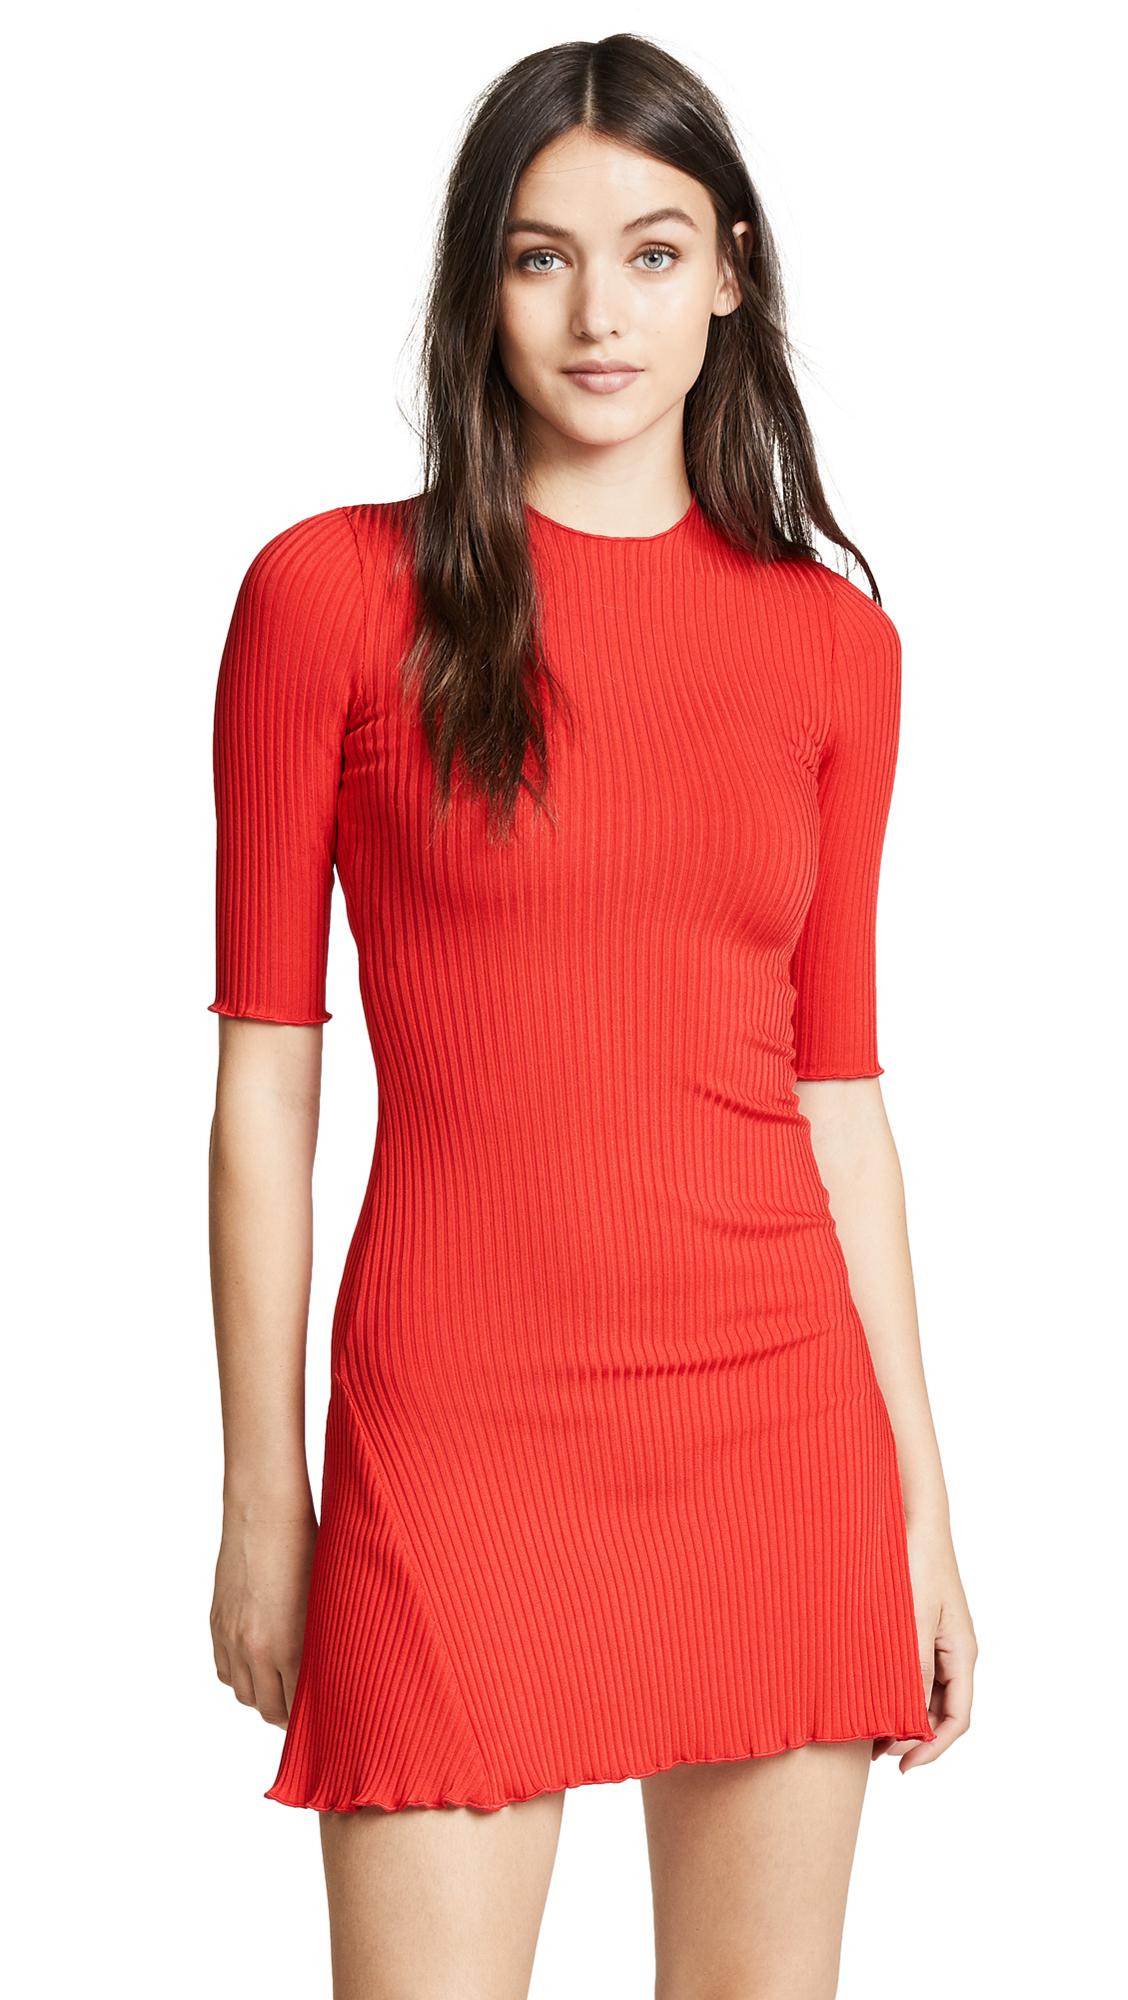 Bec & Bridge Babes Club Mini Dress online dresses sales